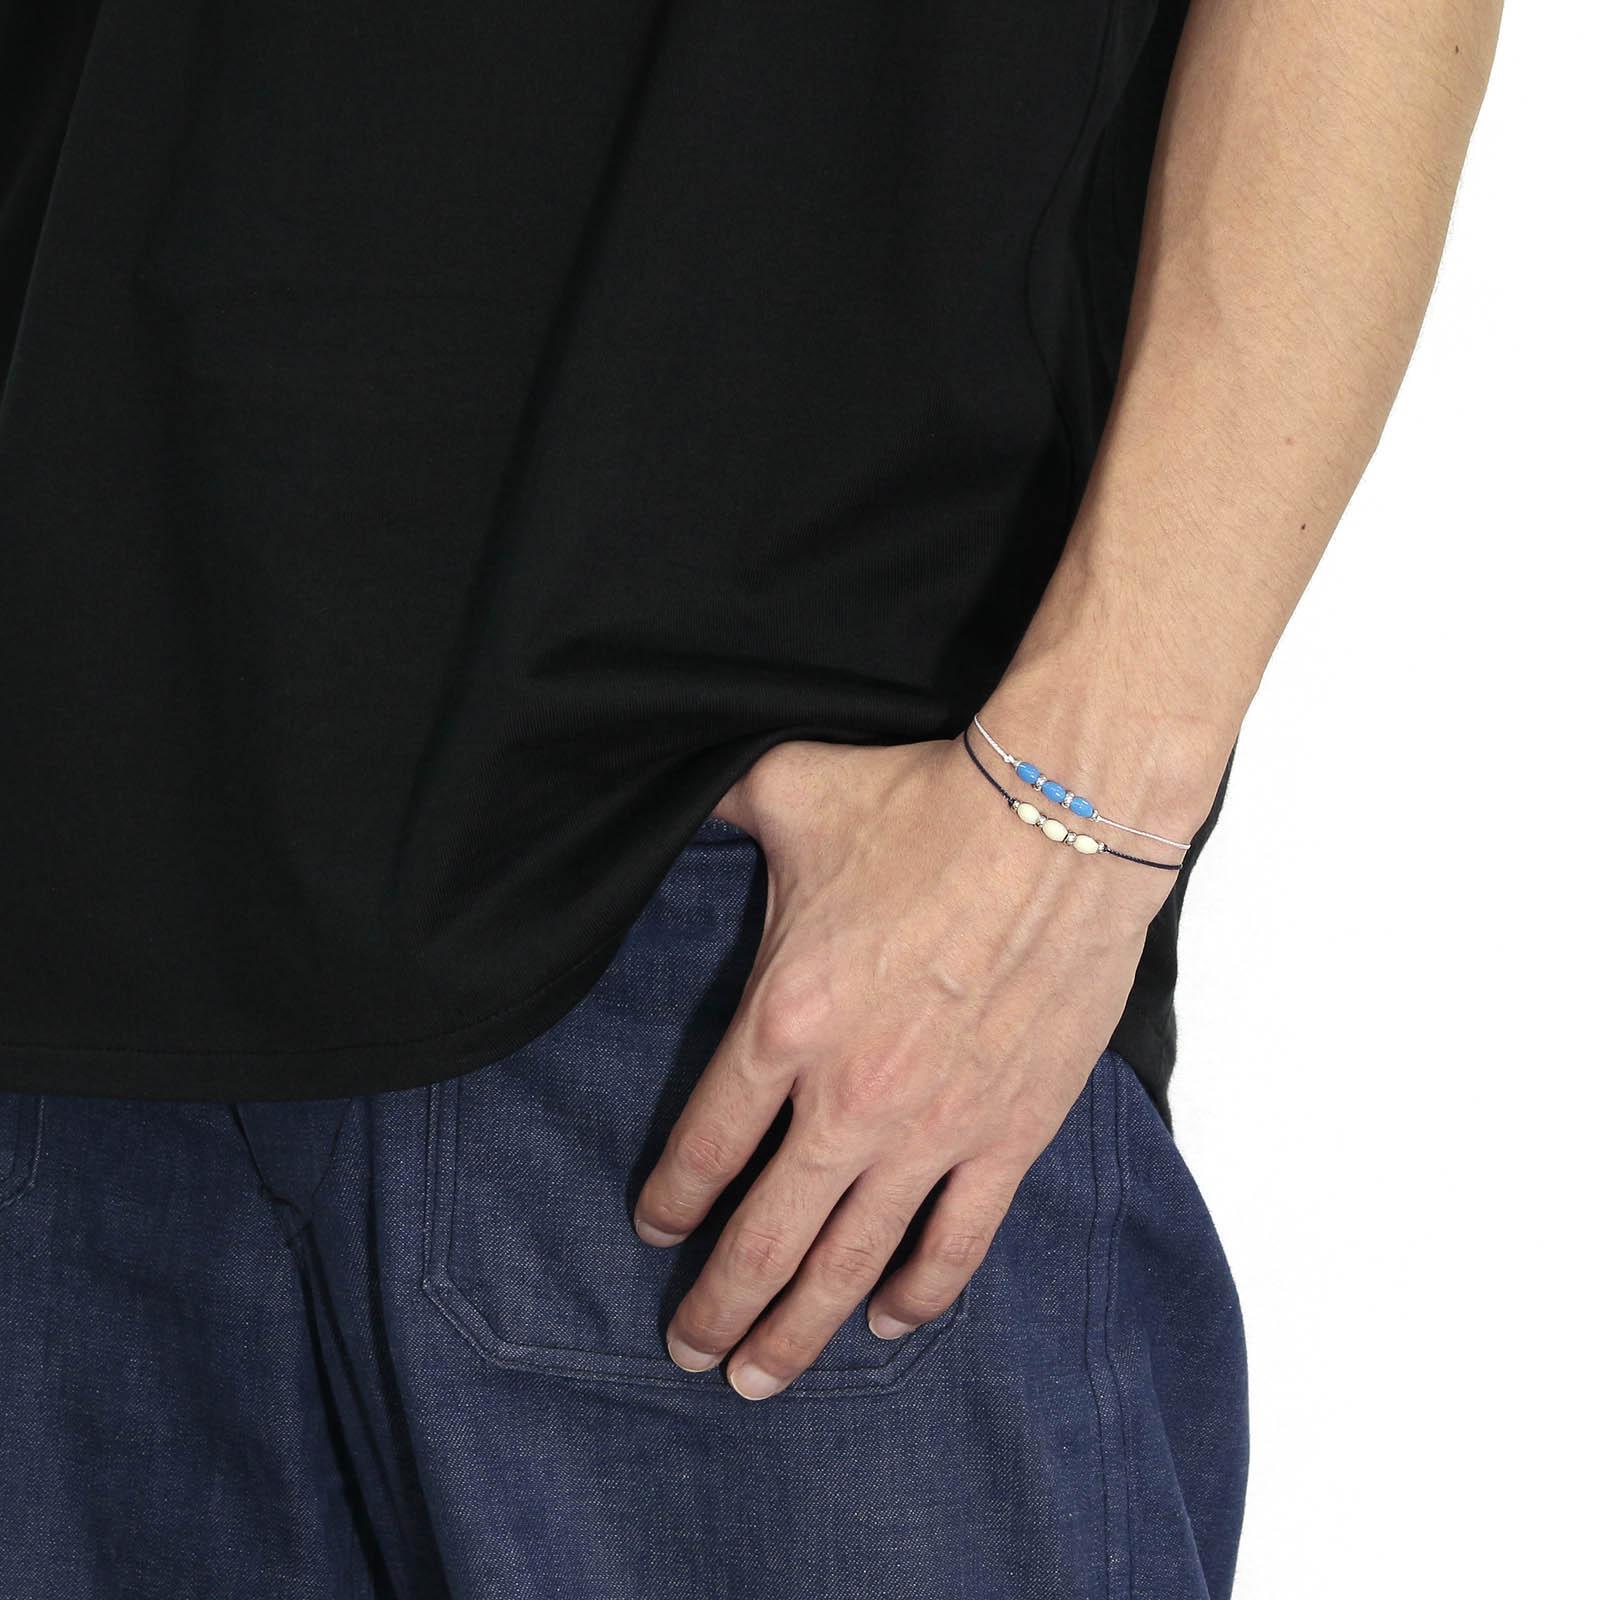 LEON別注 One Mile Jewelry PDS Beads Bracelet